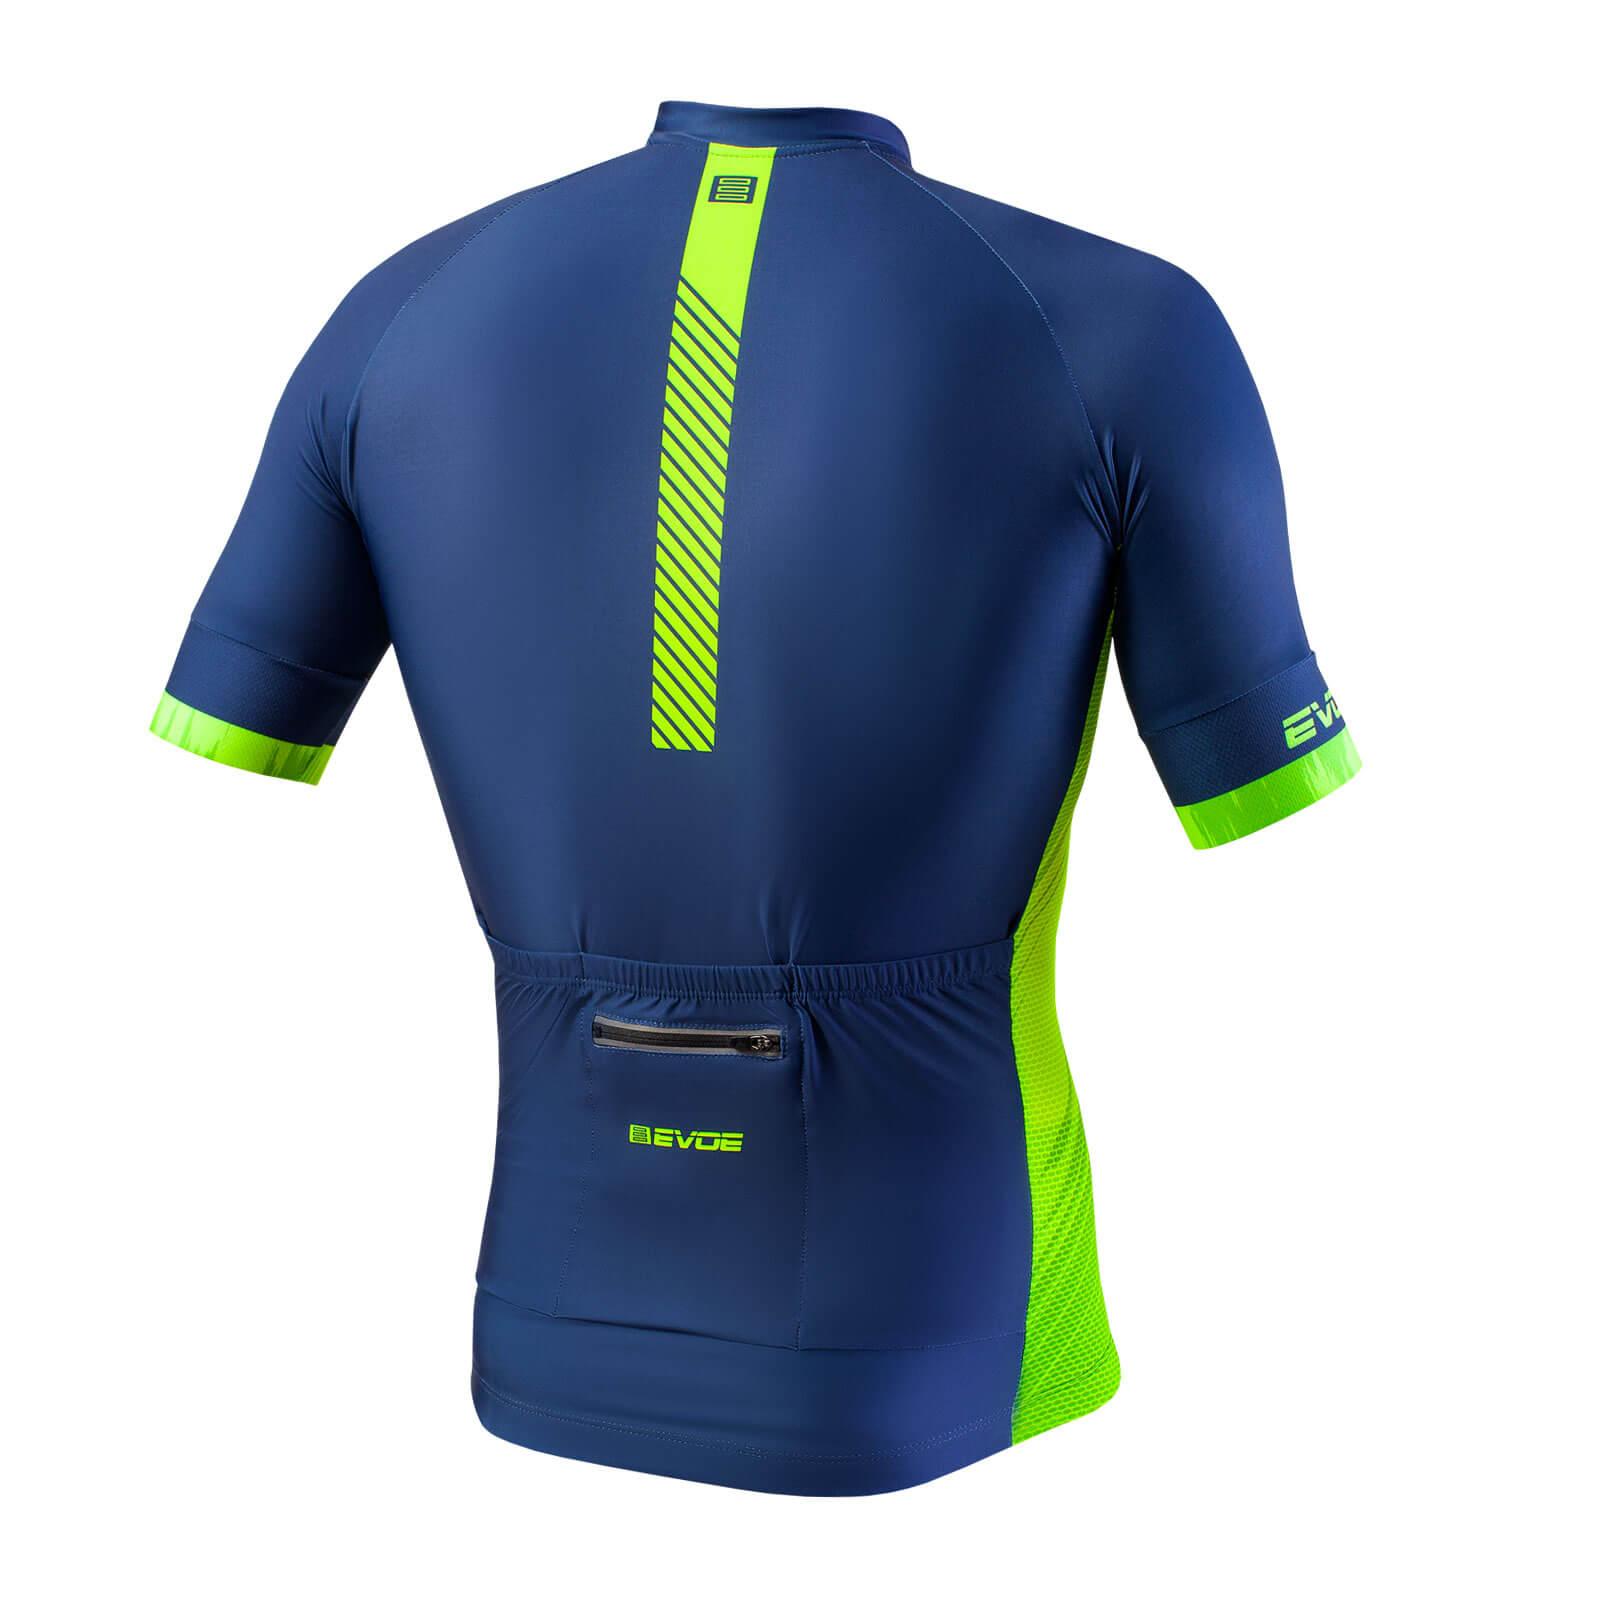 Camisa Evoe na cor Azul/Amarelo Neon